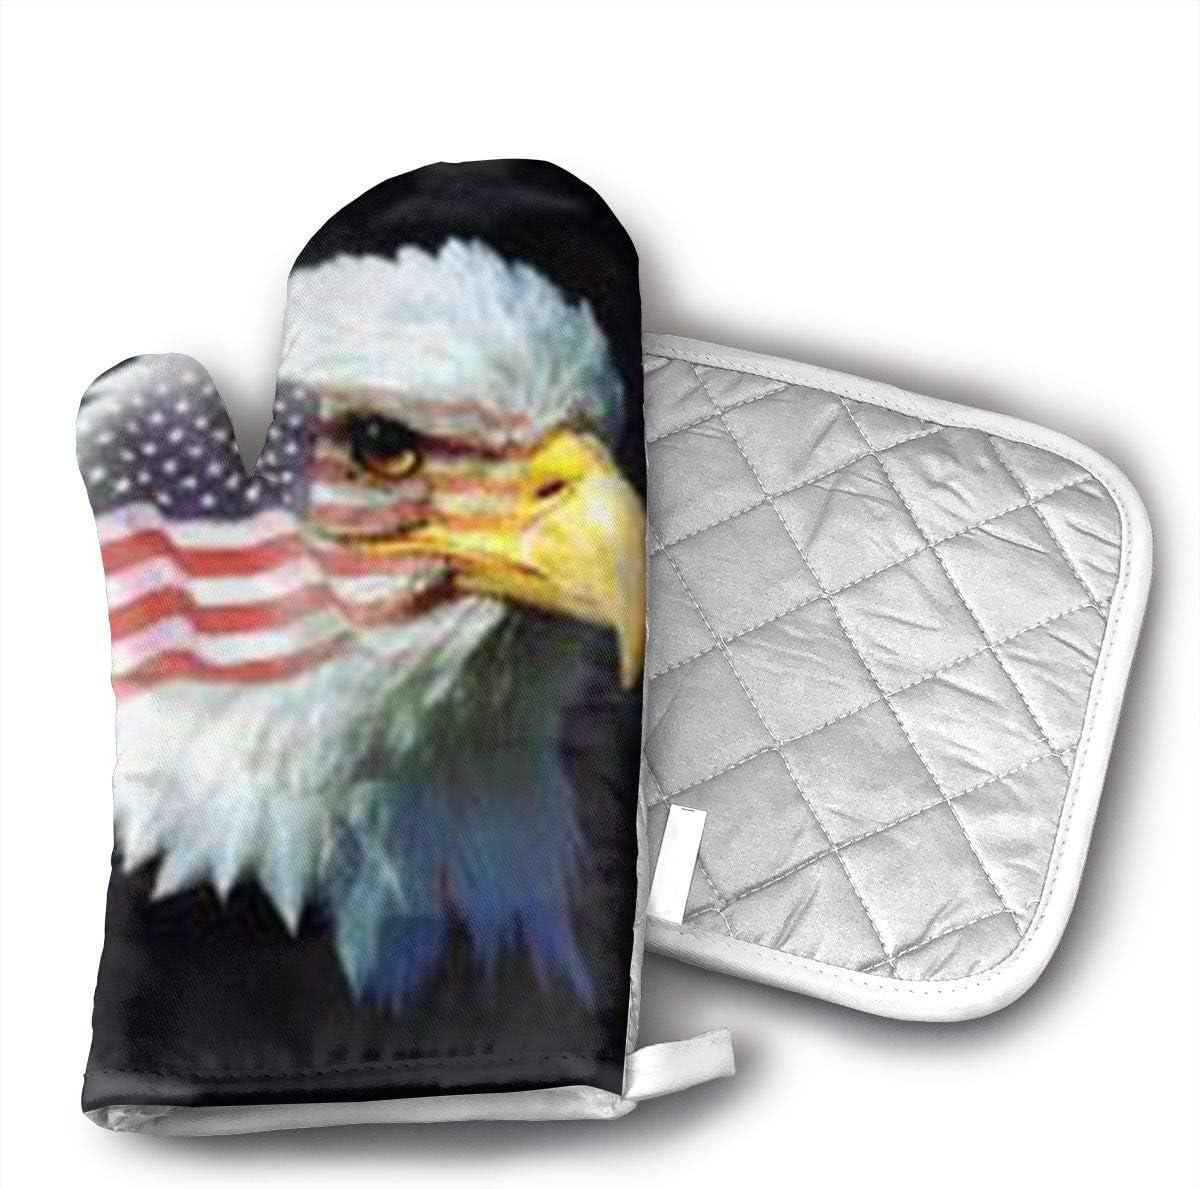 GUYDHL Unisex Oven Mitt and Pot Holder for Patriotic Eagle Flag - 2 Pair